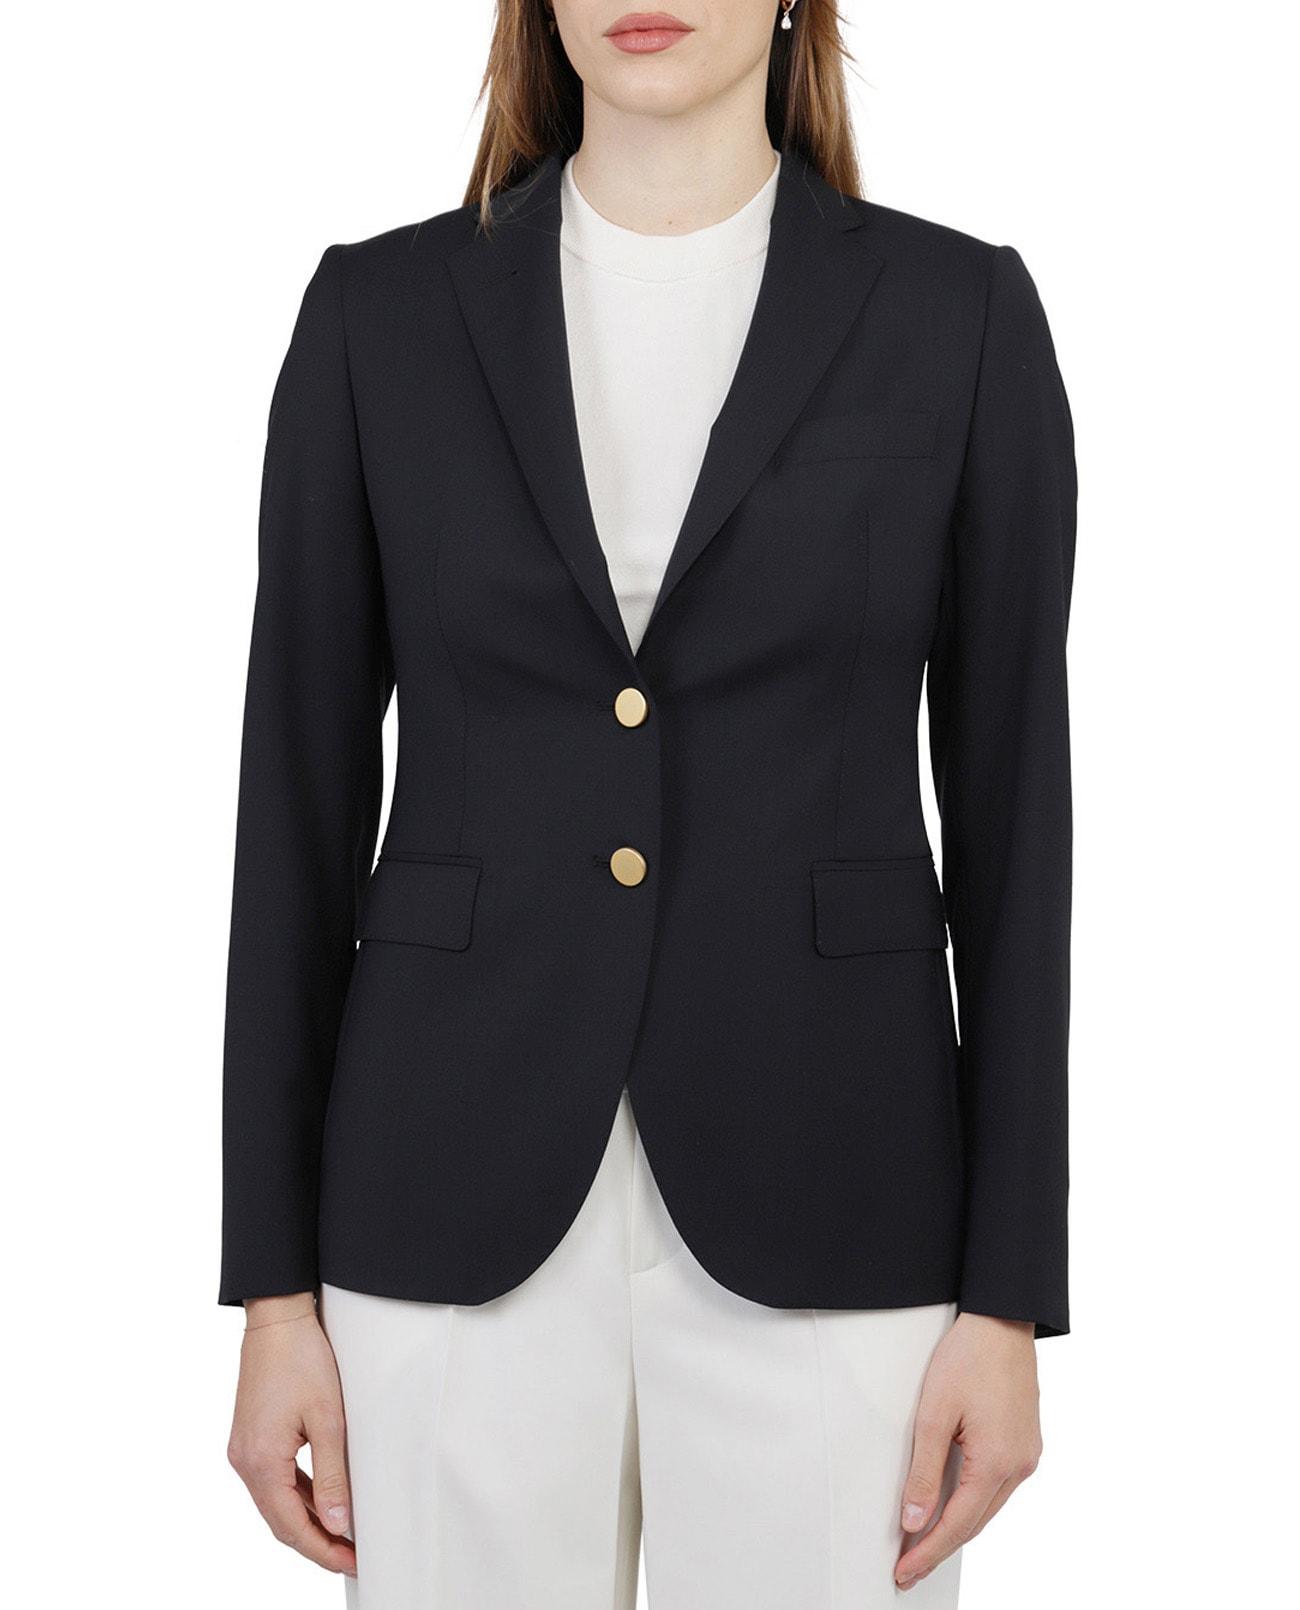 Tagliatore Navy Jacket